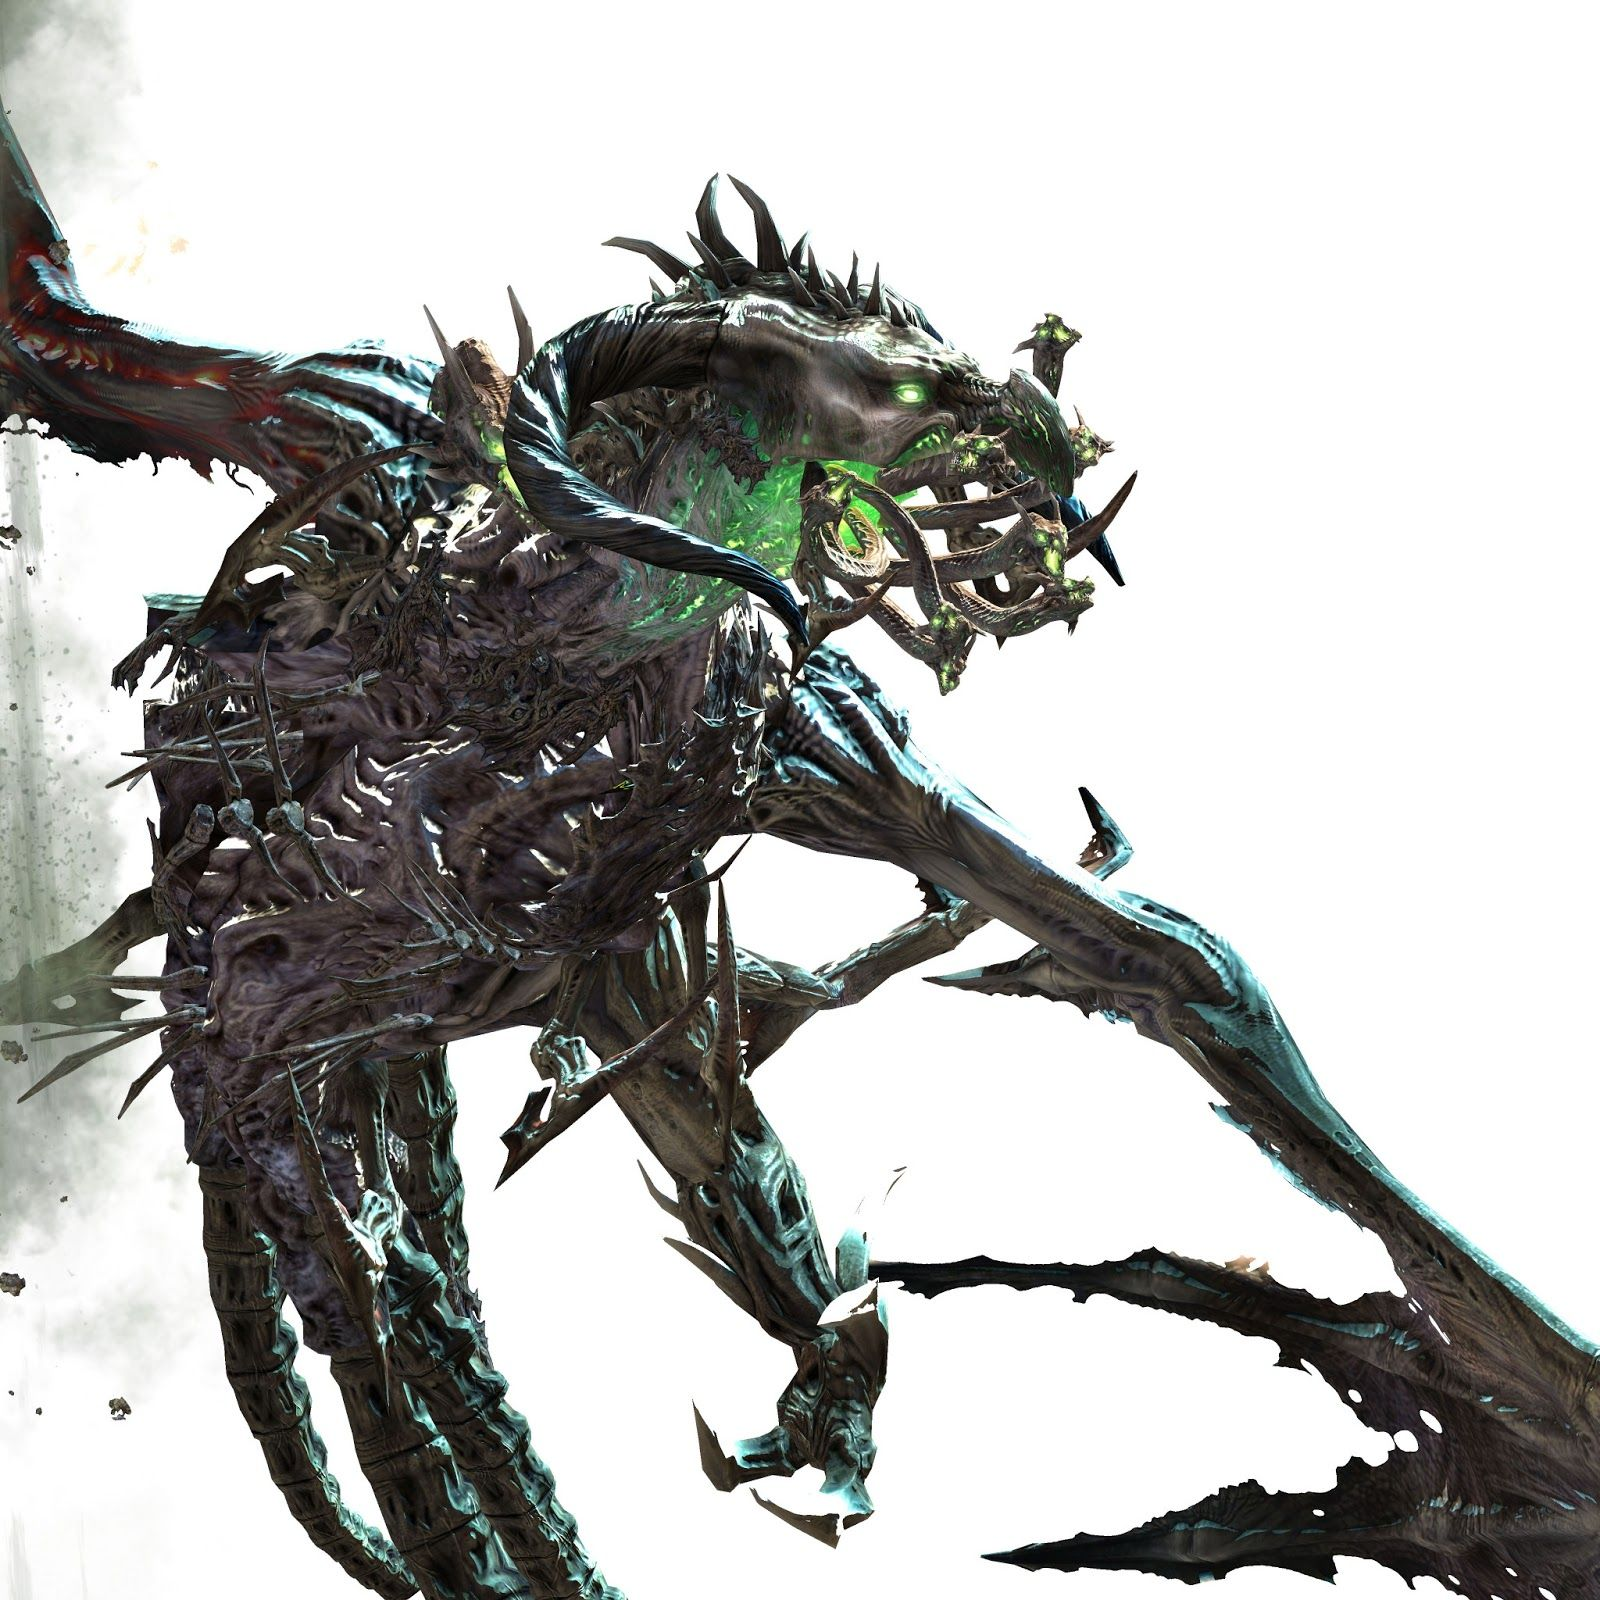 Art by Katy Hargrove: Guild Wars 2 Boss Zhaitan